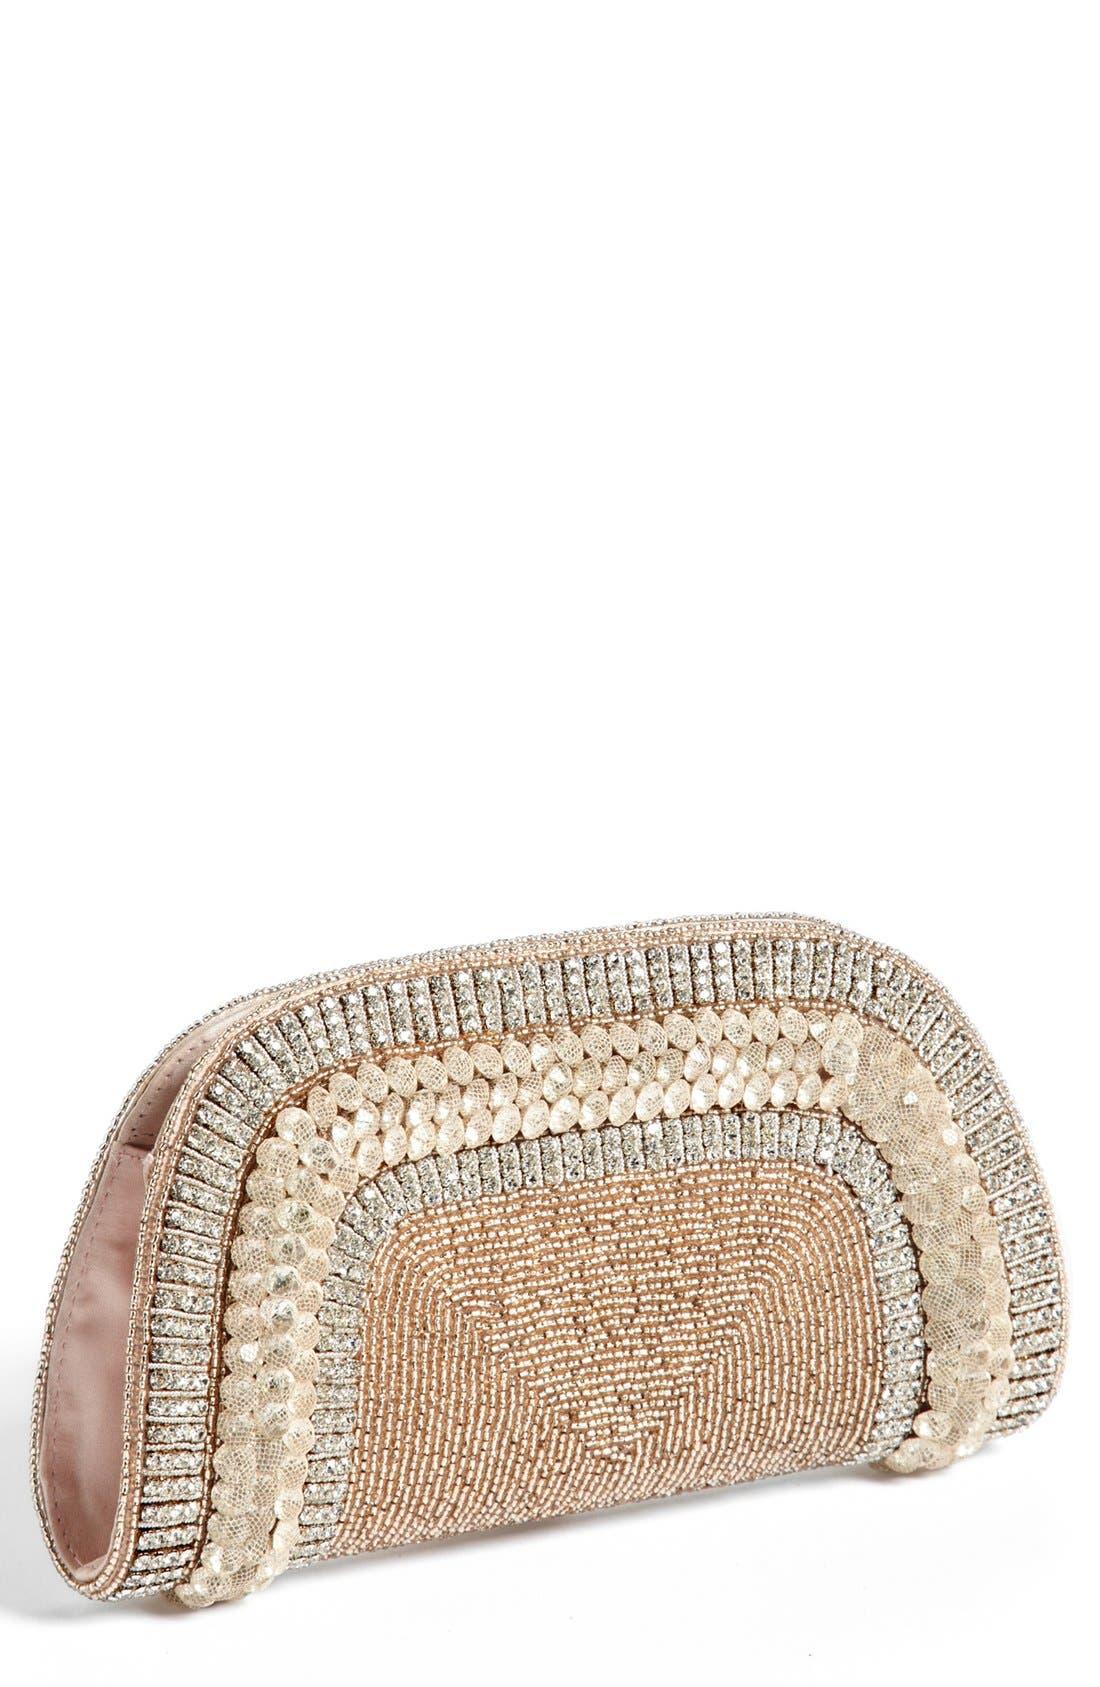 Alternate Image 1 Selected - Micky London Handbags Embellished Fan Clutch